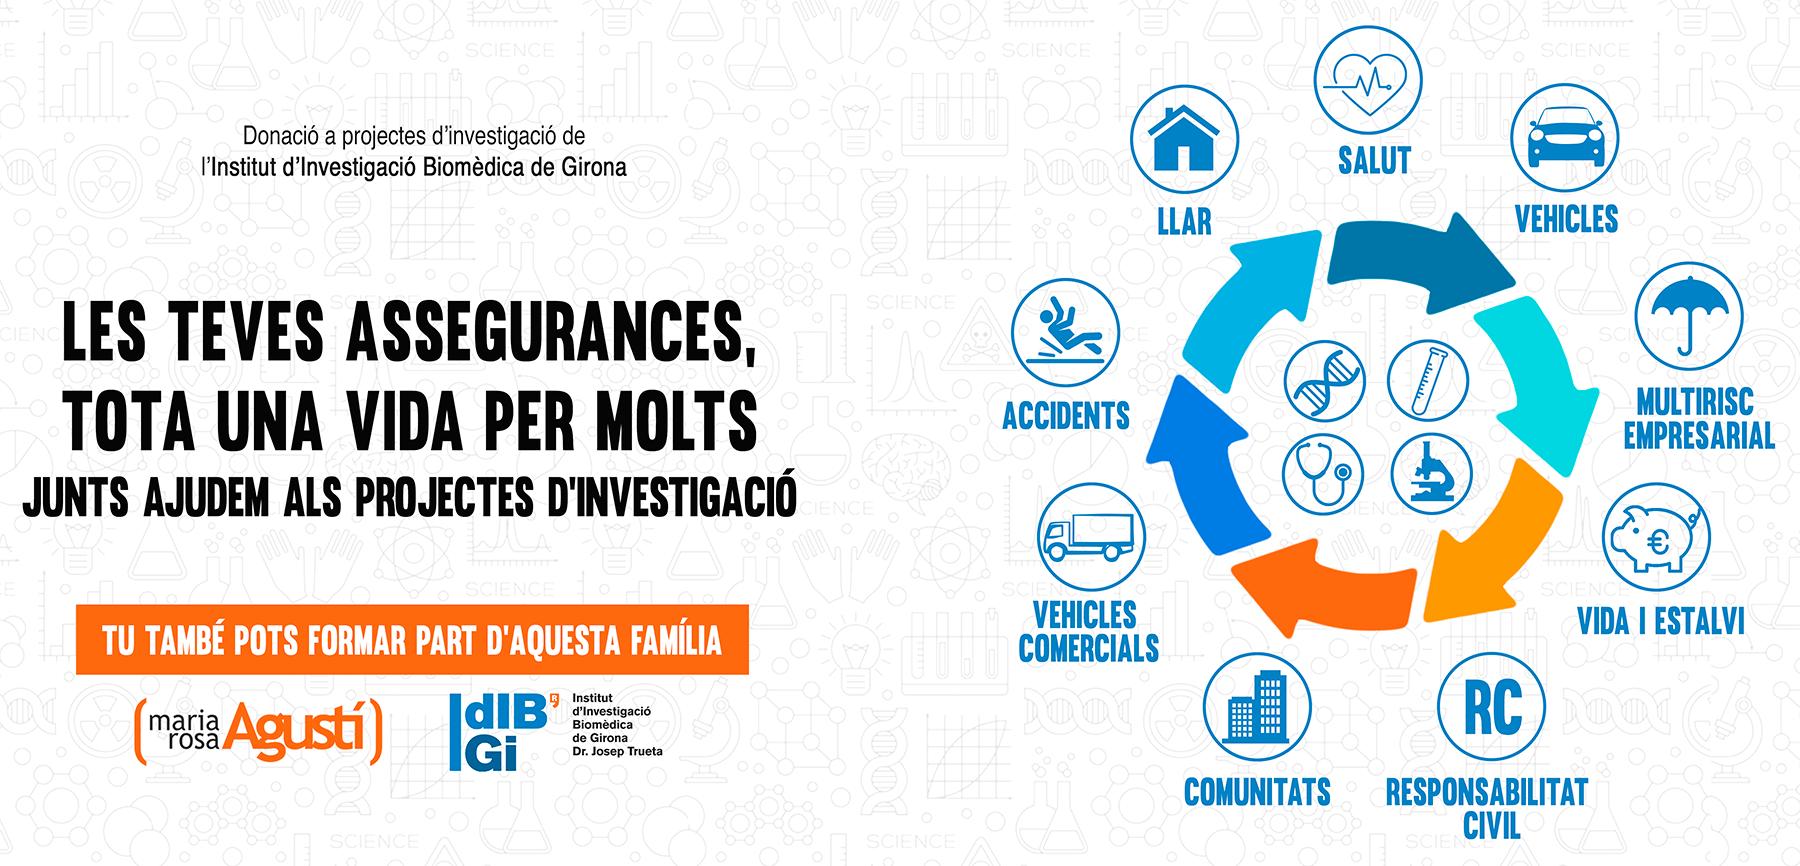 M. Rosa Agusti, agent d'assegurances Allianz a Girona donarà beneficis a Idibgi